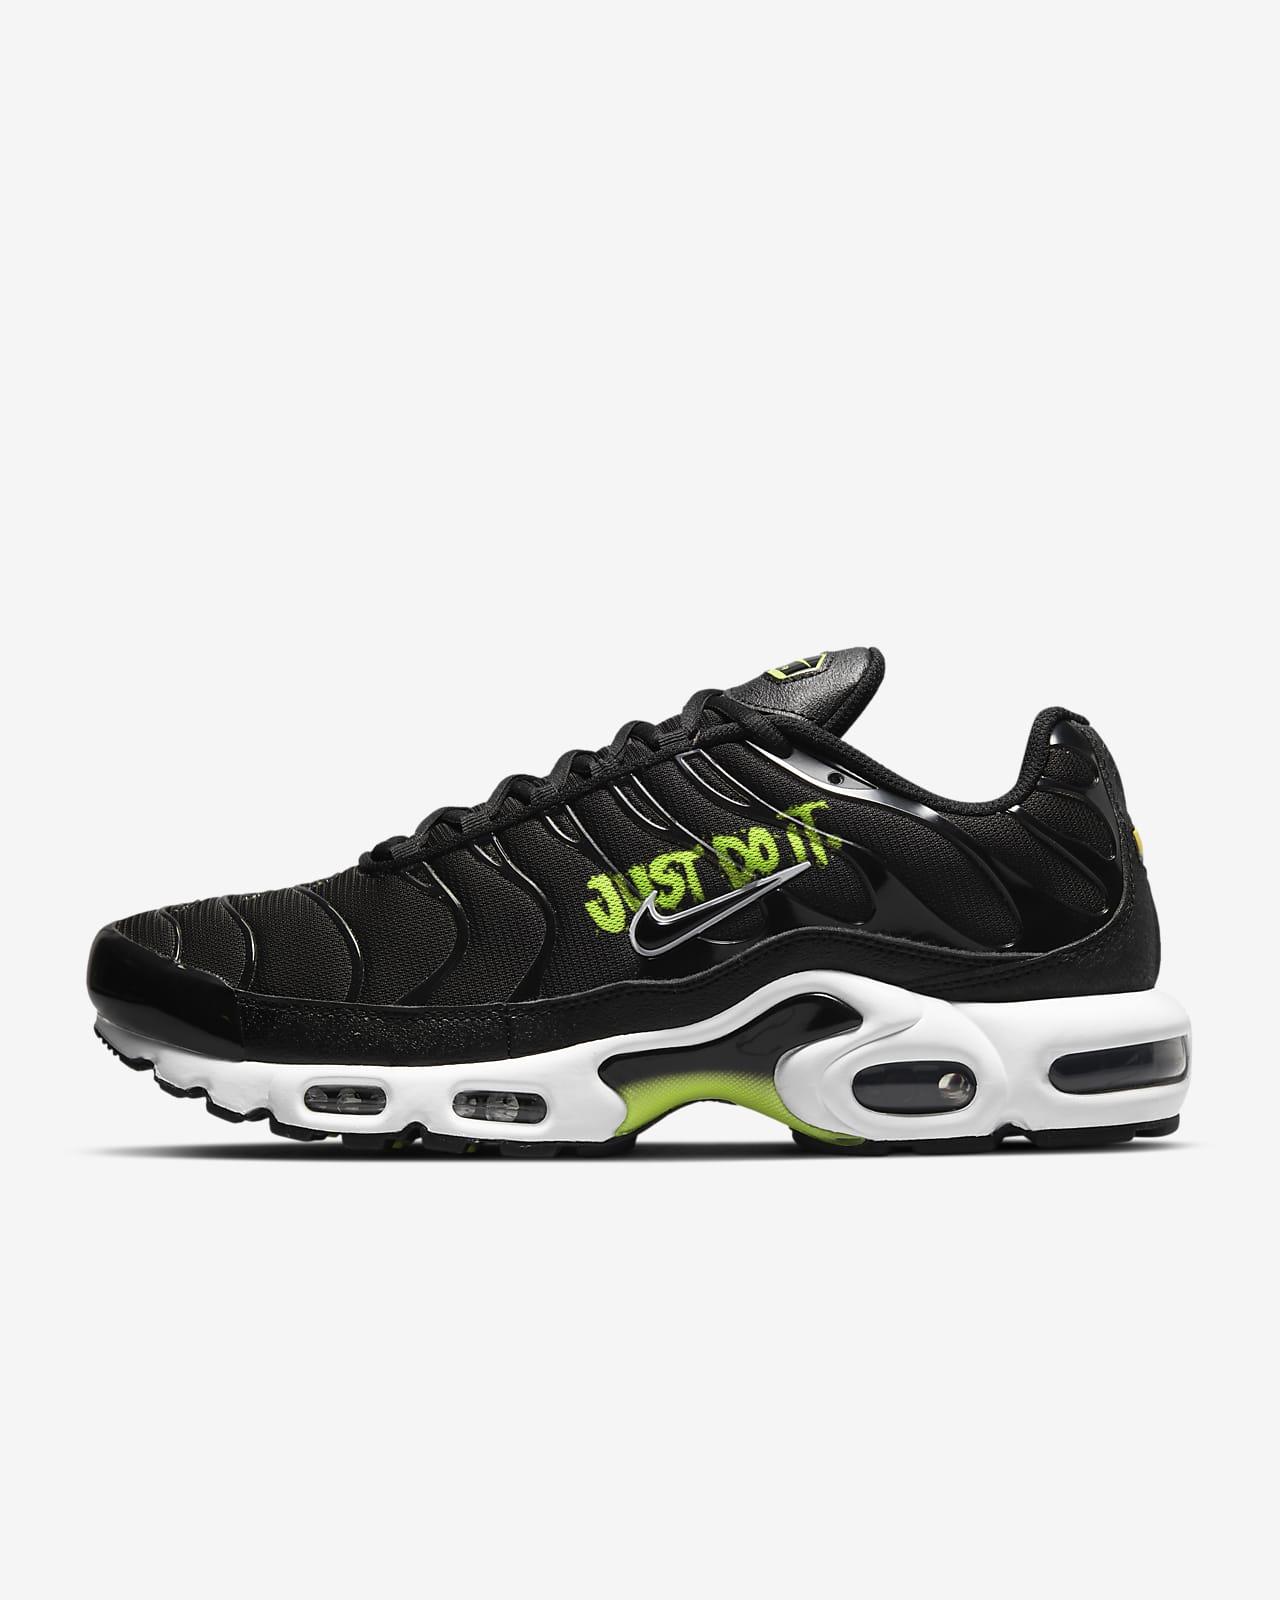 Chaussure Nike Air Max Plus pour Homme. Nike LU